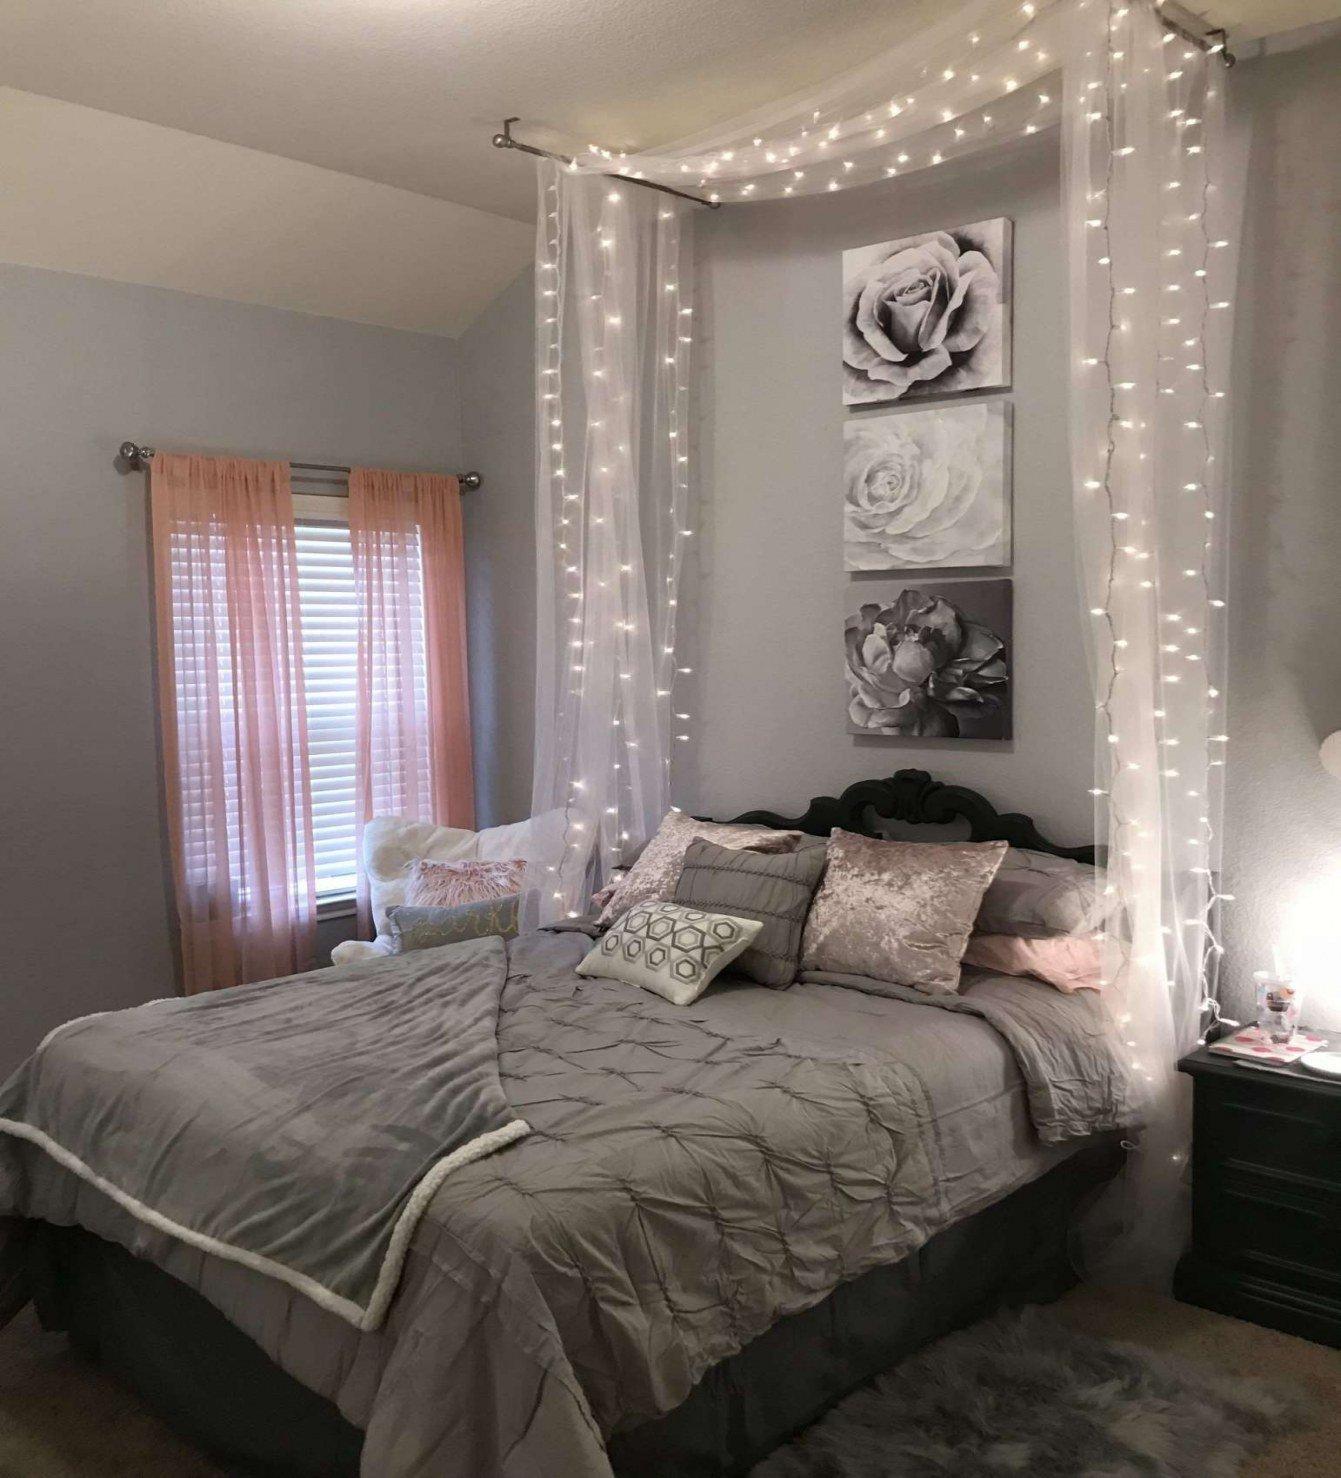 Kid Bedroom Decorating Idea Beautiful Bedrooms for Girls Girls Bedroom Wall Decor New Girl Wall